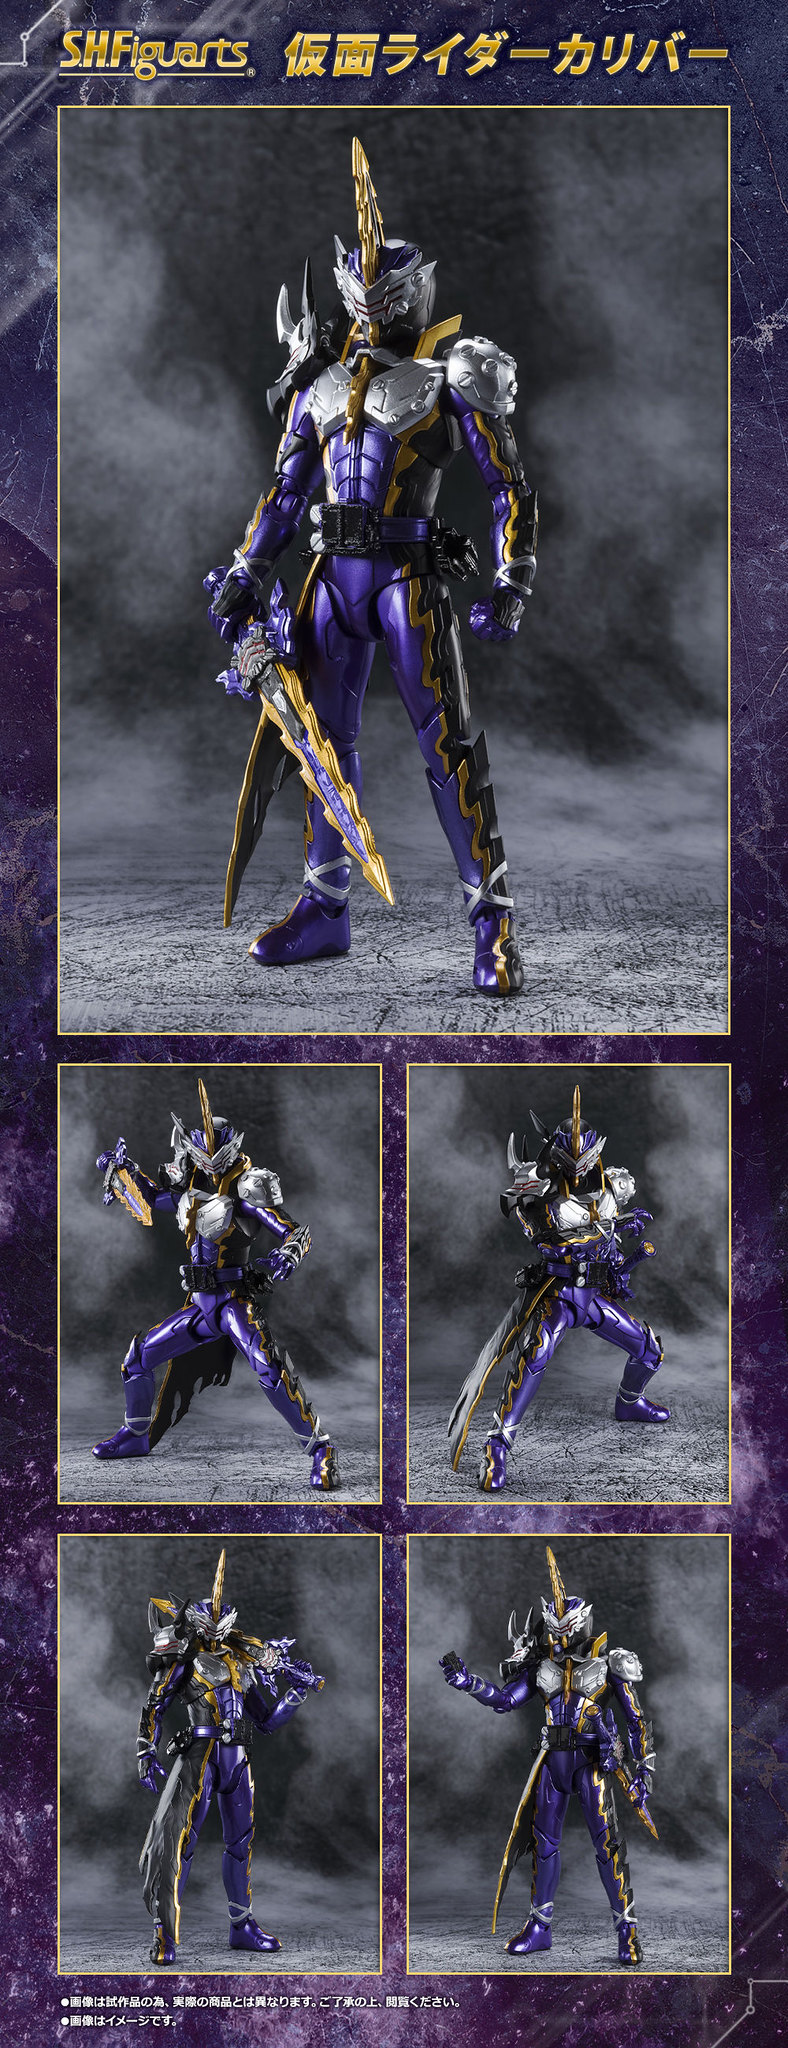 S.H.Figuarts「假面騎士Calibur Jaaku Dragon」背叛的惡役騎士登場!